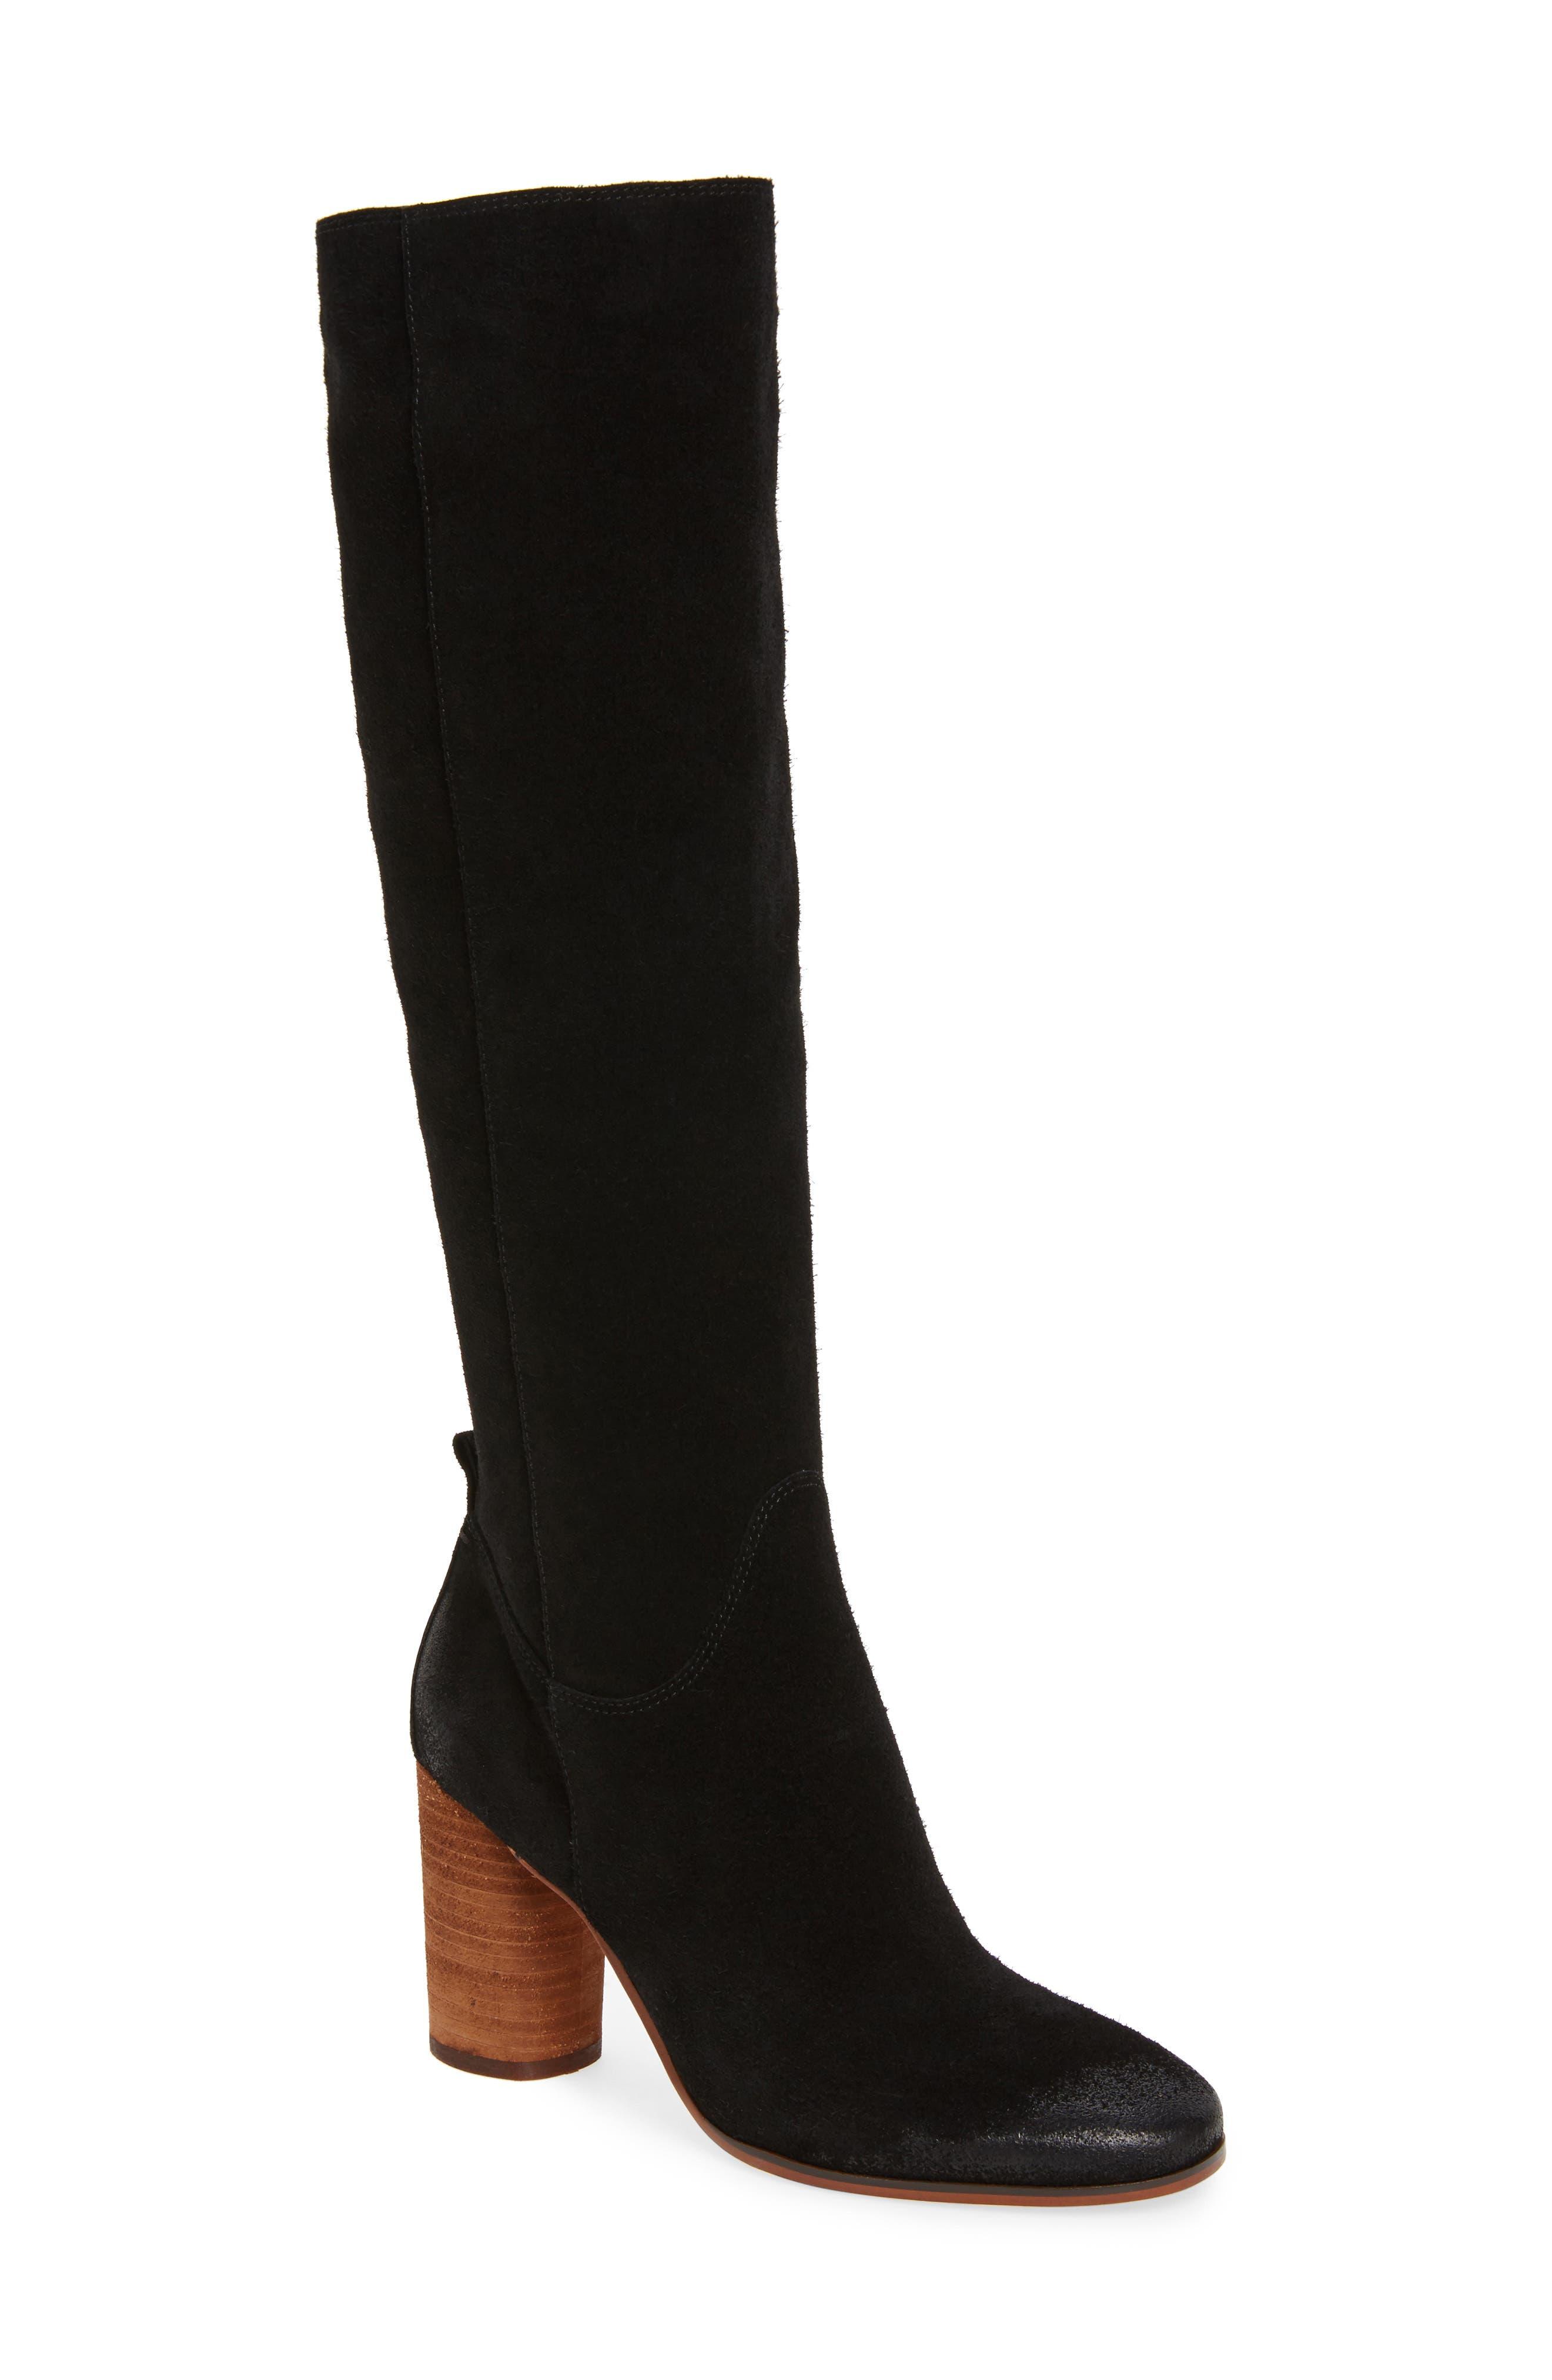 Alternate Image 1 Selected - Sam Edelman Camellia Tall Boot (Women)